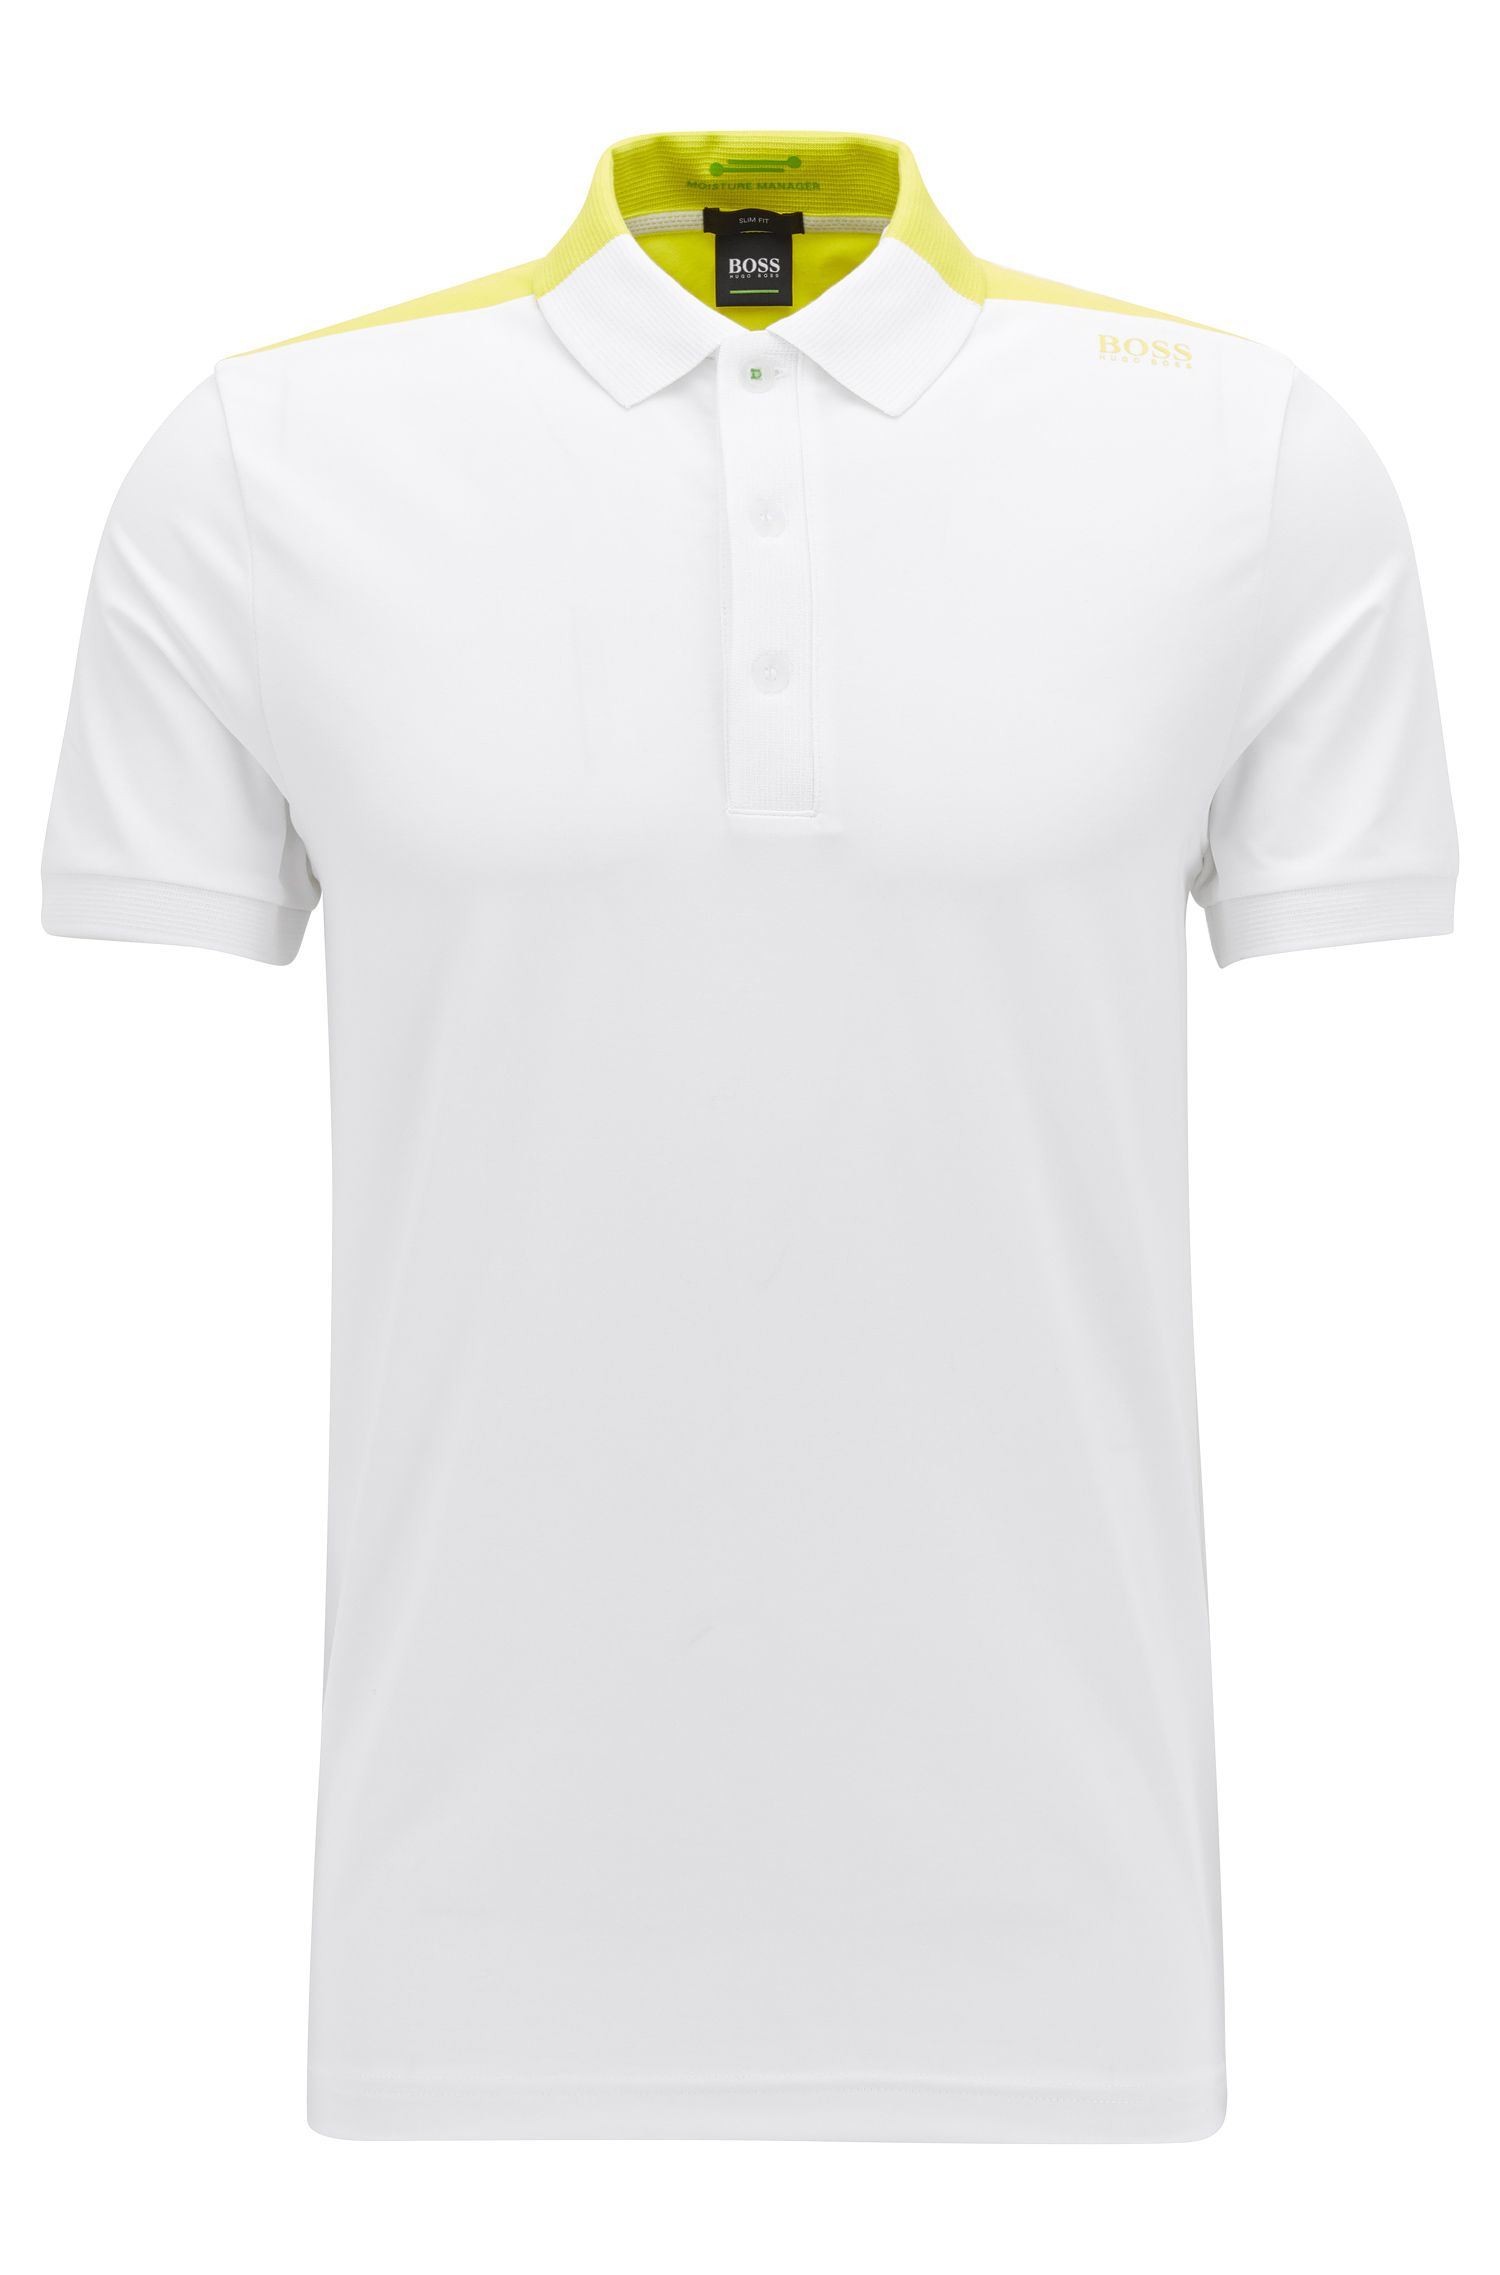 Moisture Manager Cotton Blend Polo Shirt, Slim Fit | Paule , White